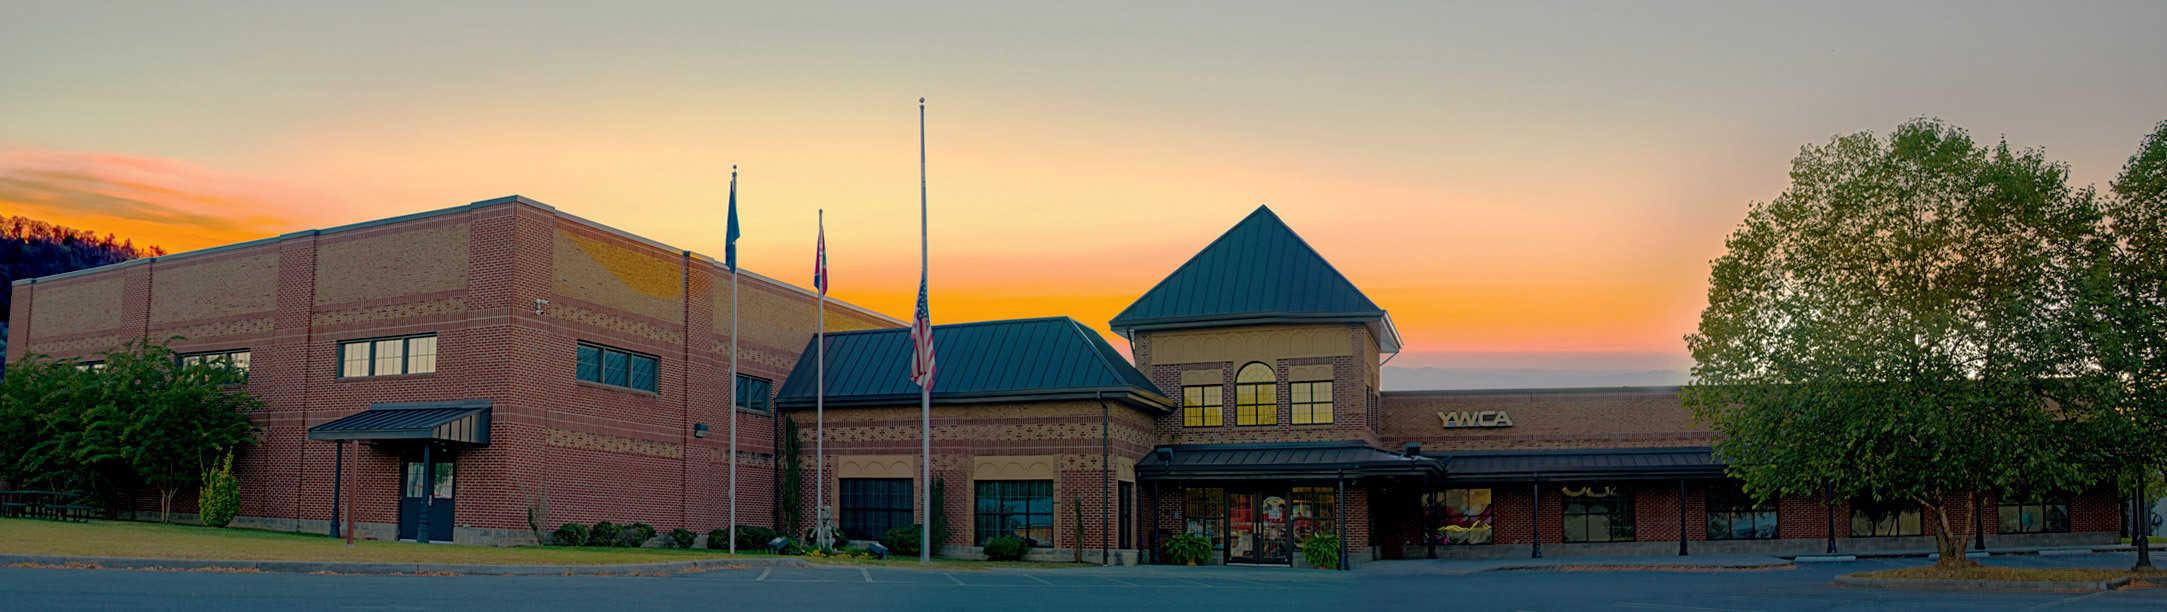 YWCA of Northeast TN & Southwest VA - Located in Bristol, Tennessee